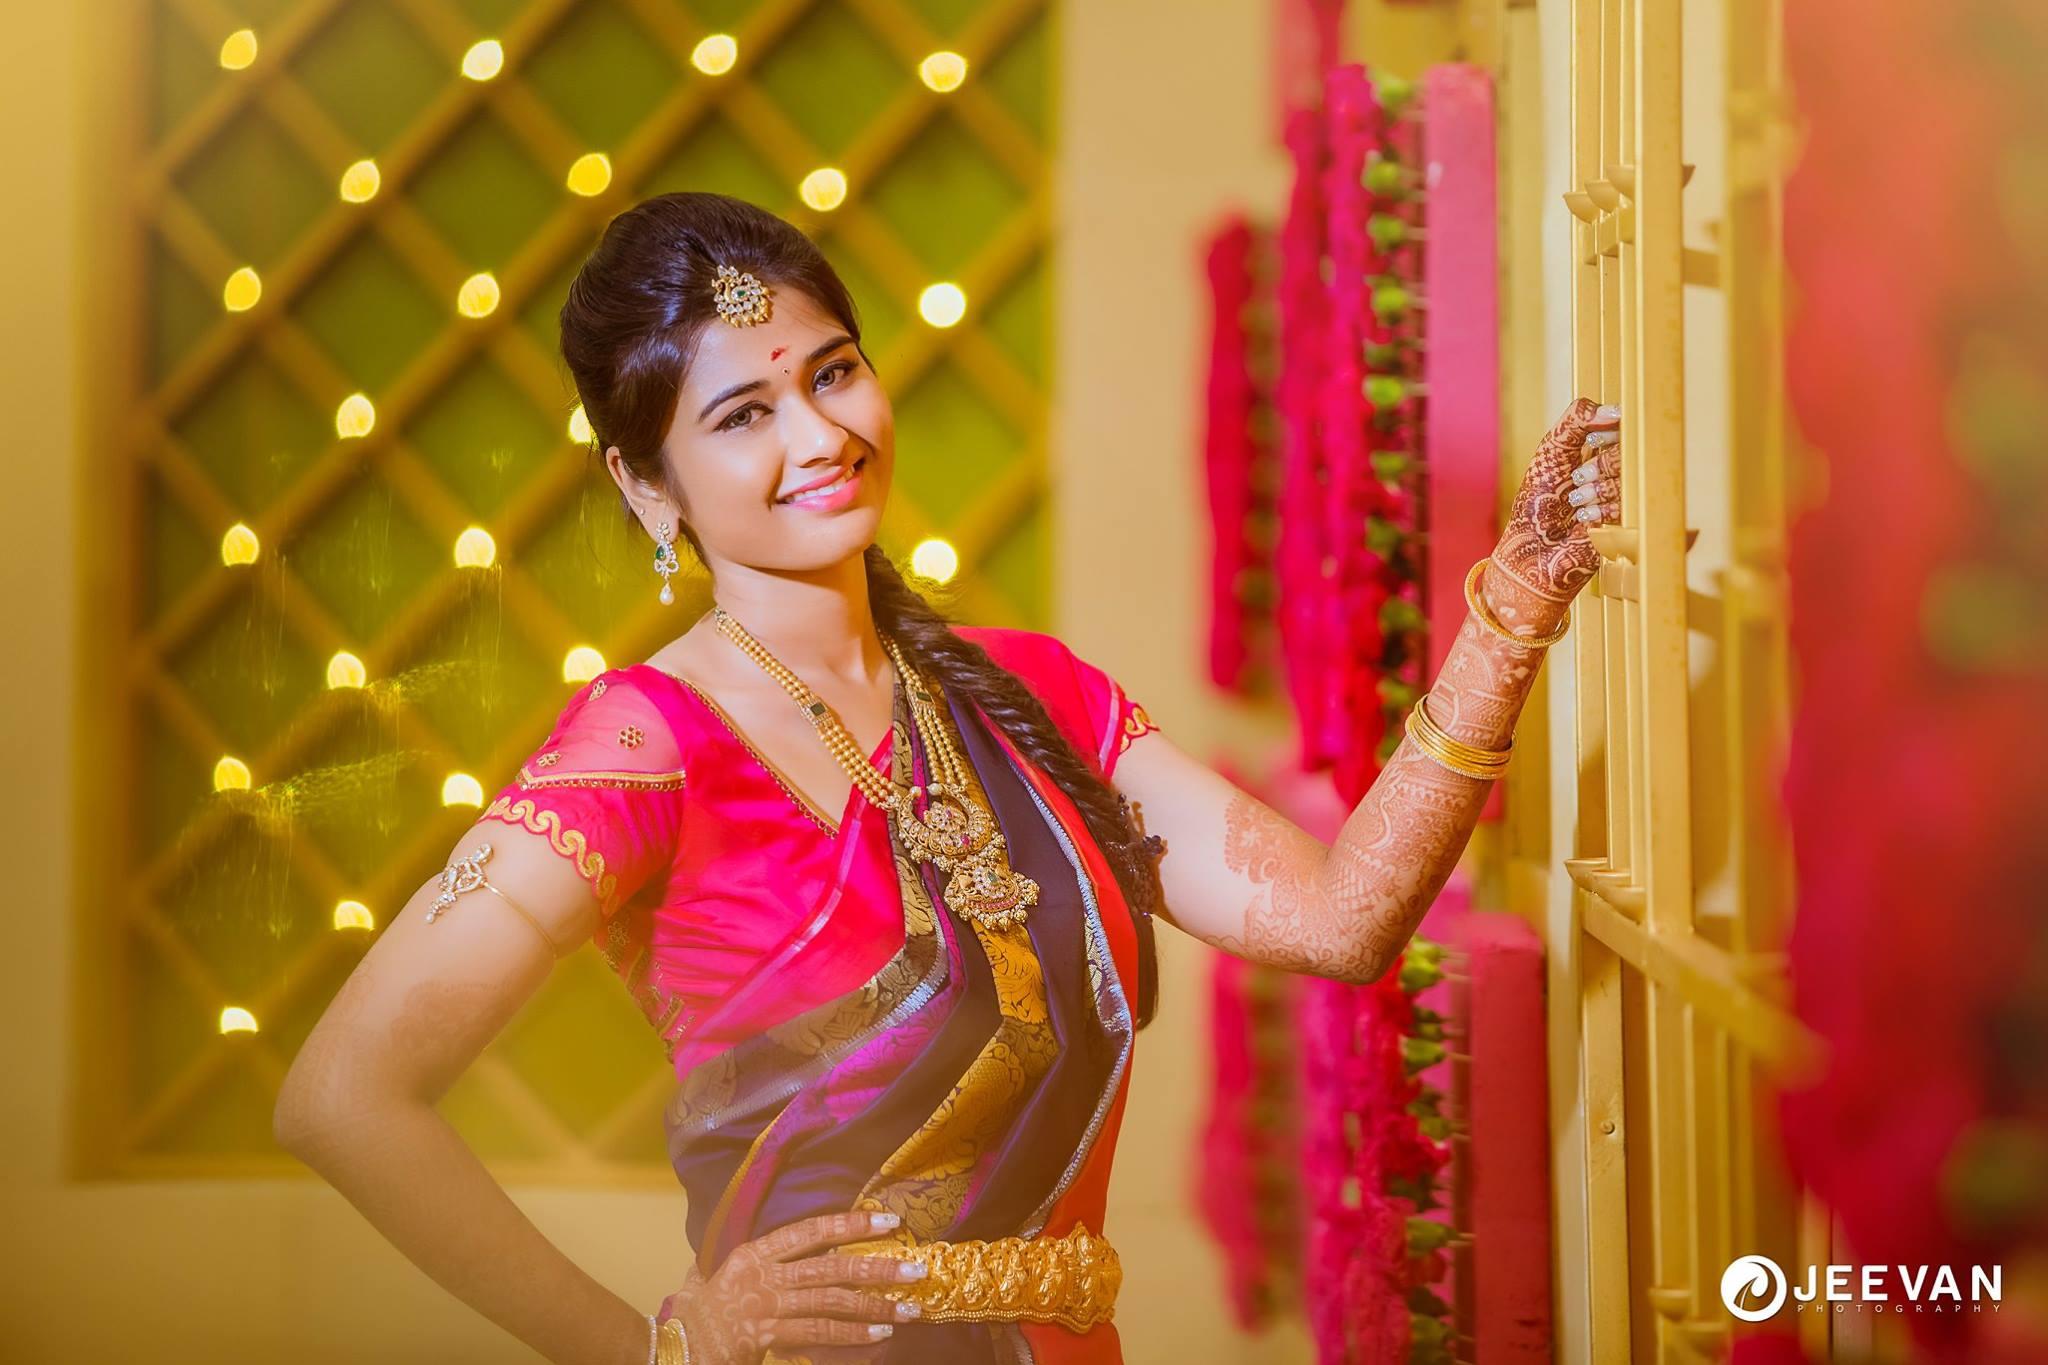 Winsome smile of a bride